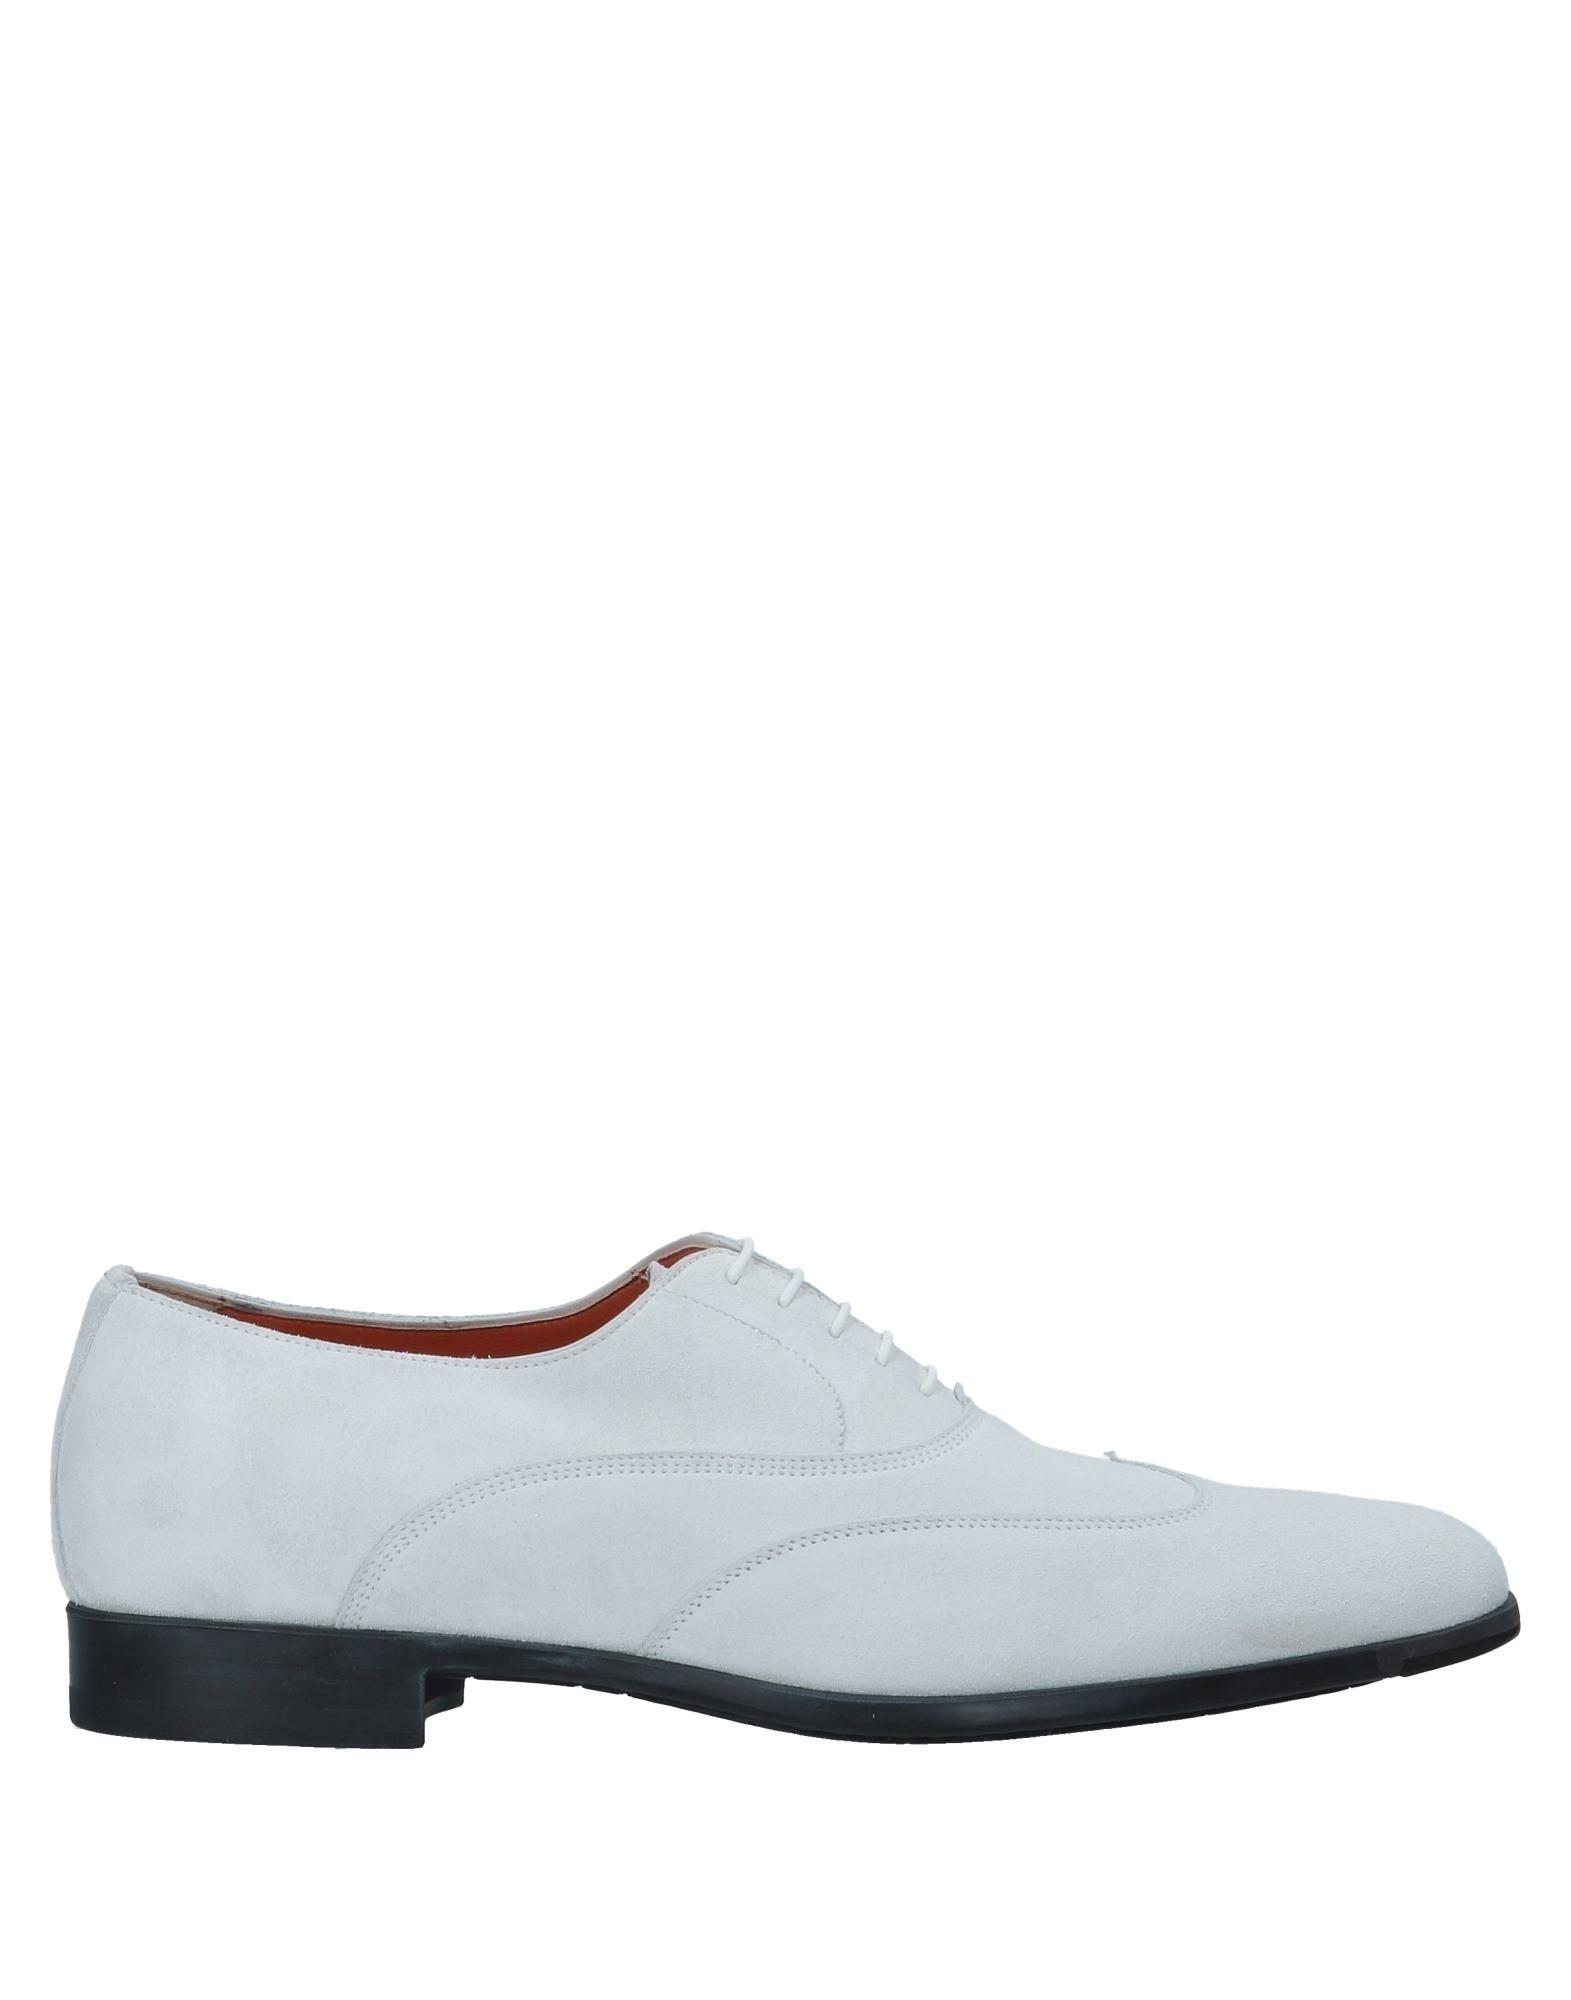 Santoni Schnürschuhe Gute Herren  11543658WT Gute Schnürschuhe Qualität beliebte Schuhe 89e23c